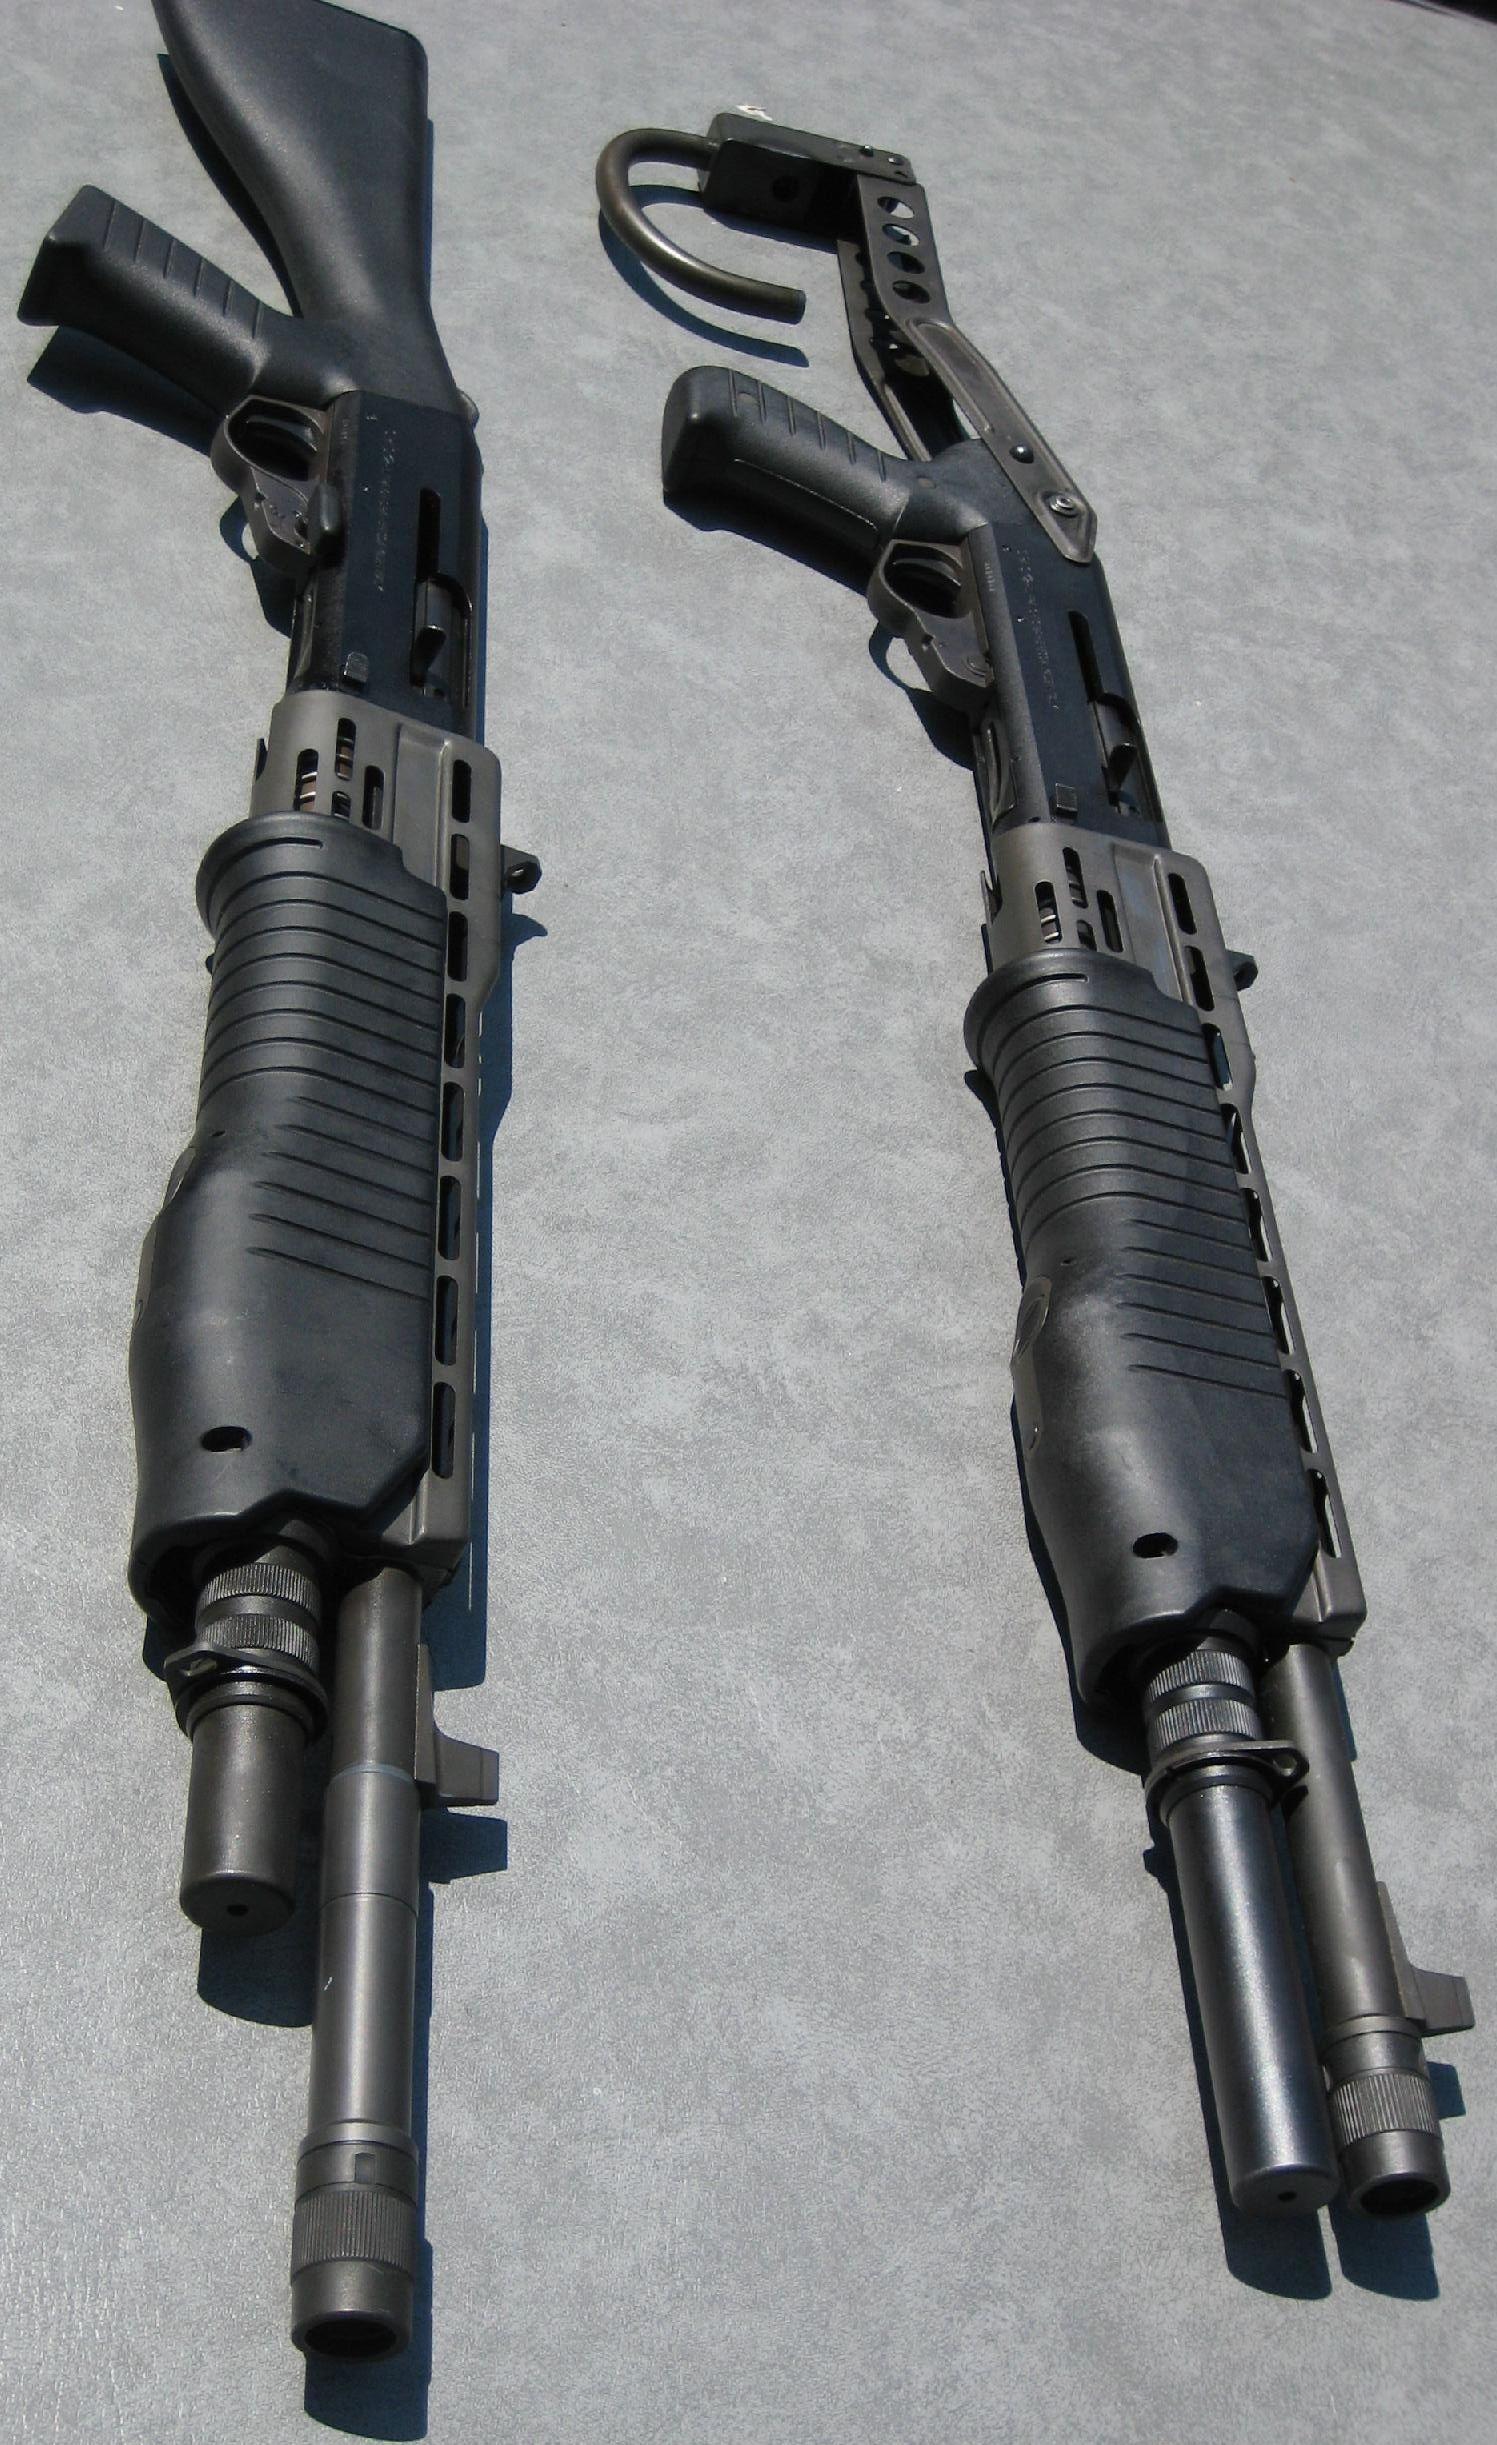 SPAS 12 dual mode (pump/semi auto) shotgun. Used a ton in movies, tv ...